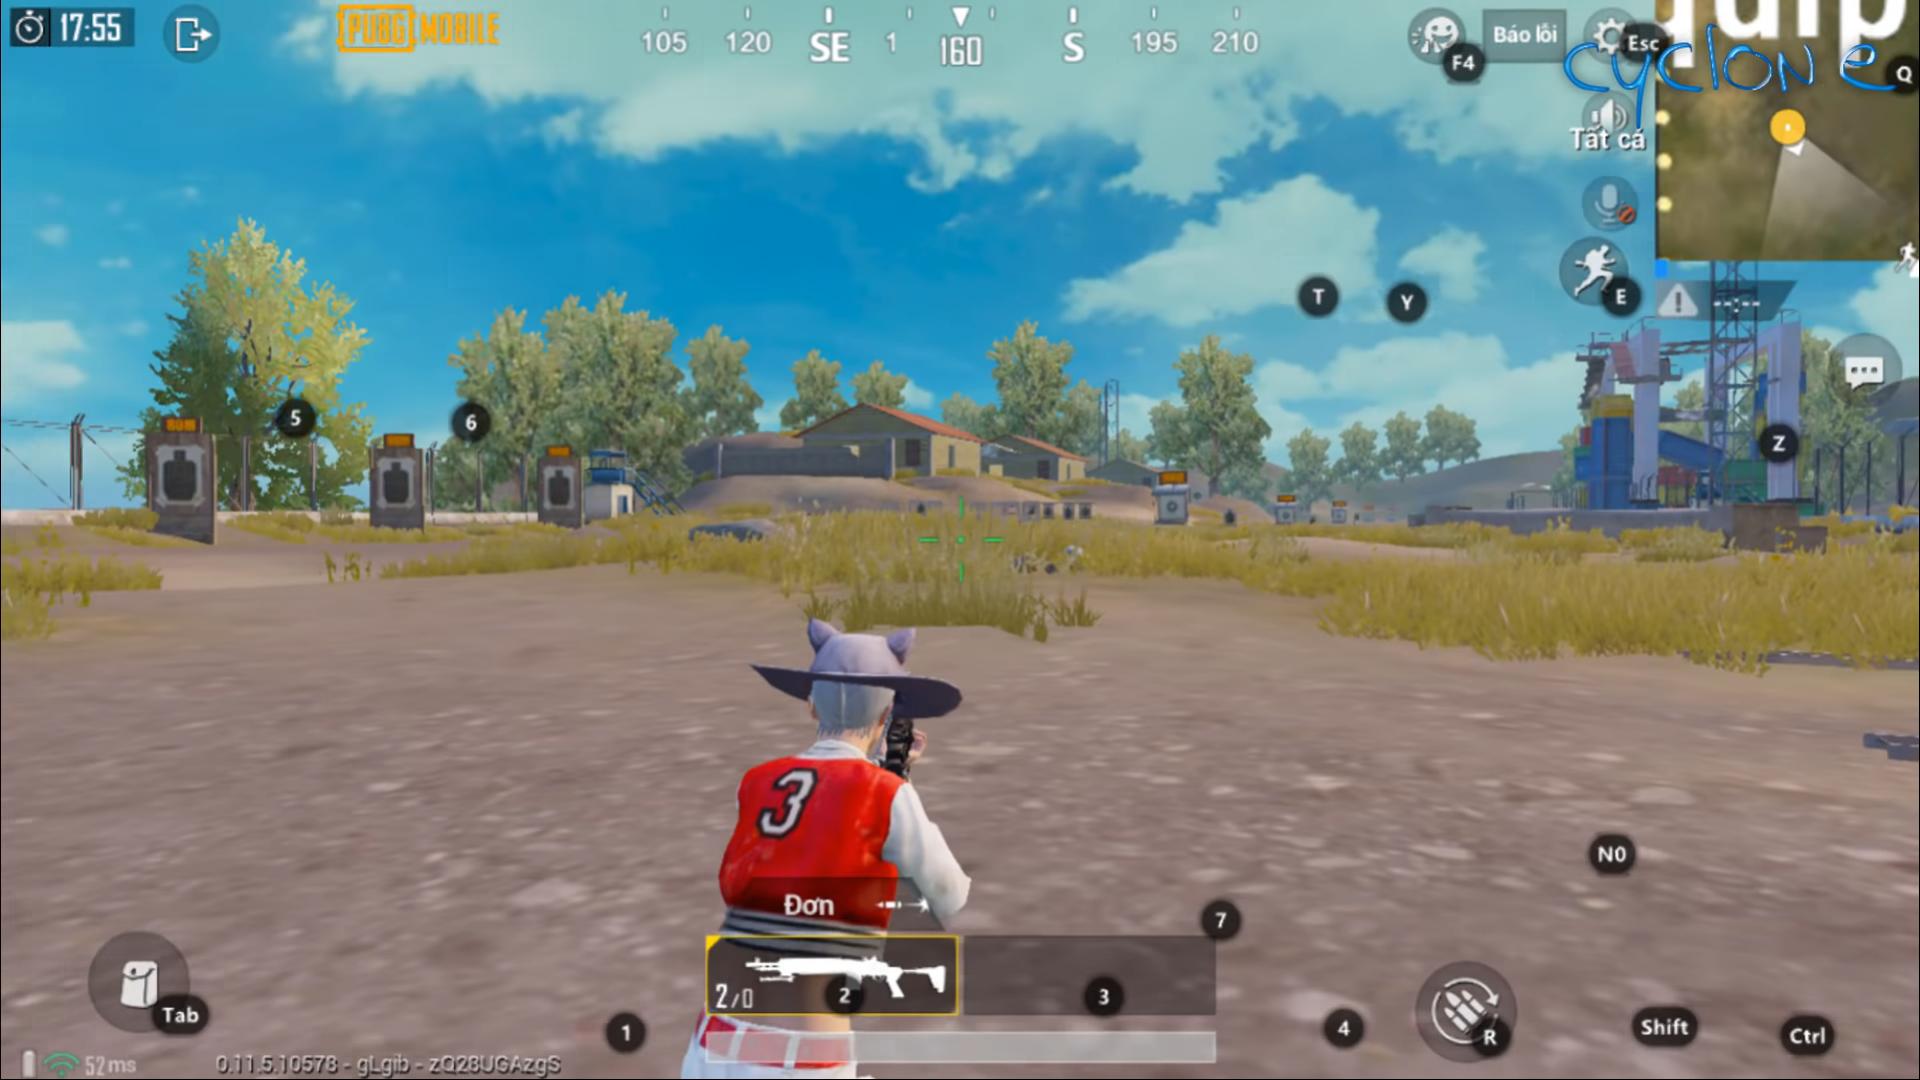 Gameloop.Mobi Tencent Emulator for PC trong 2020